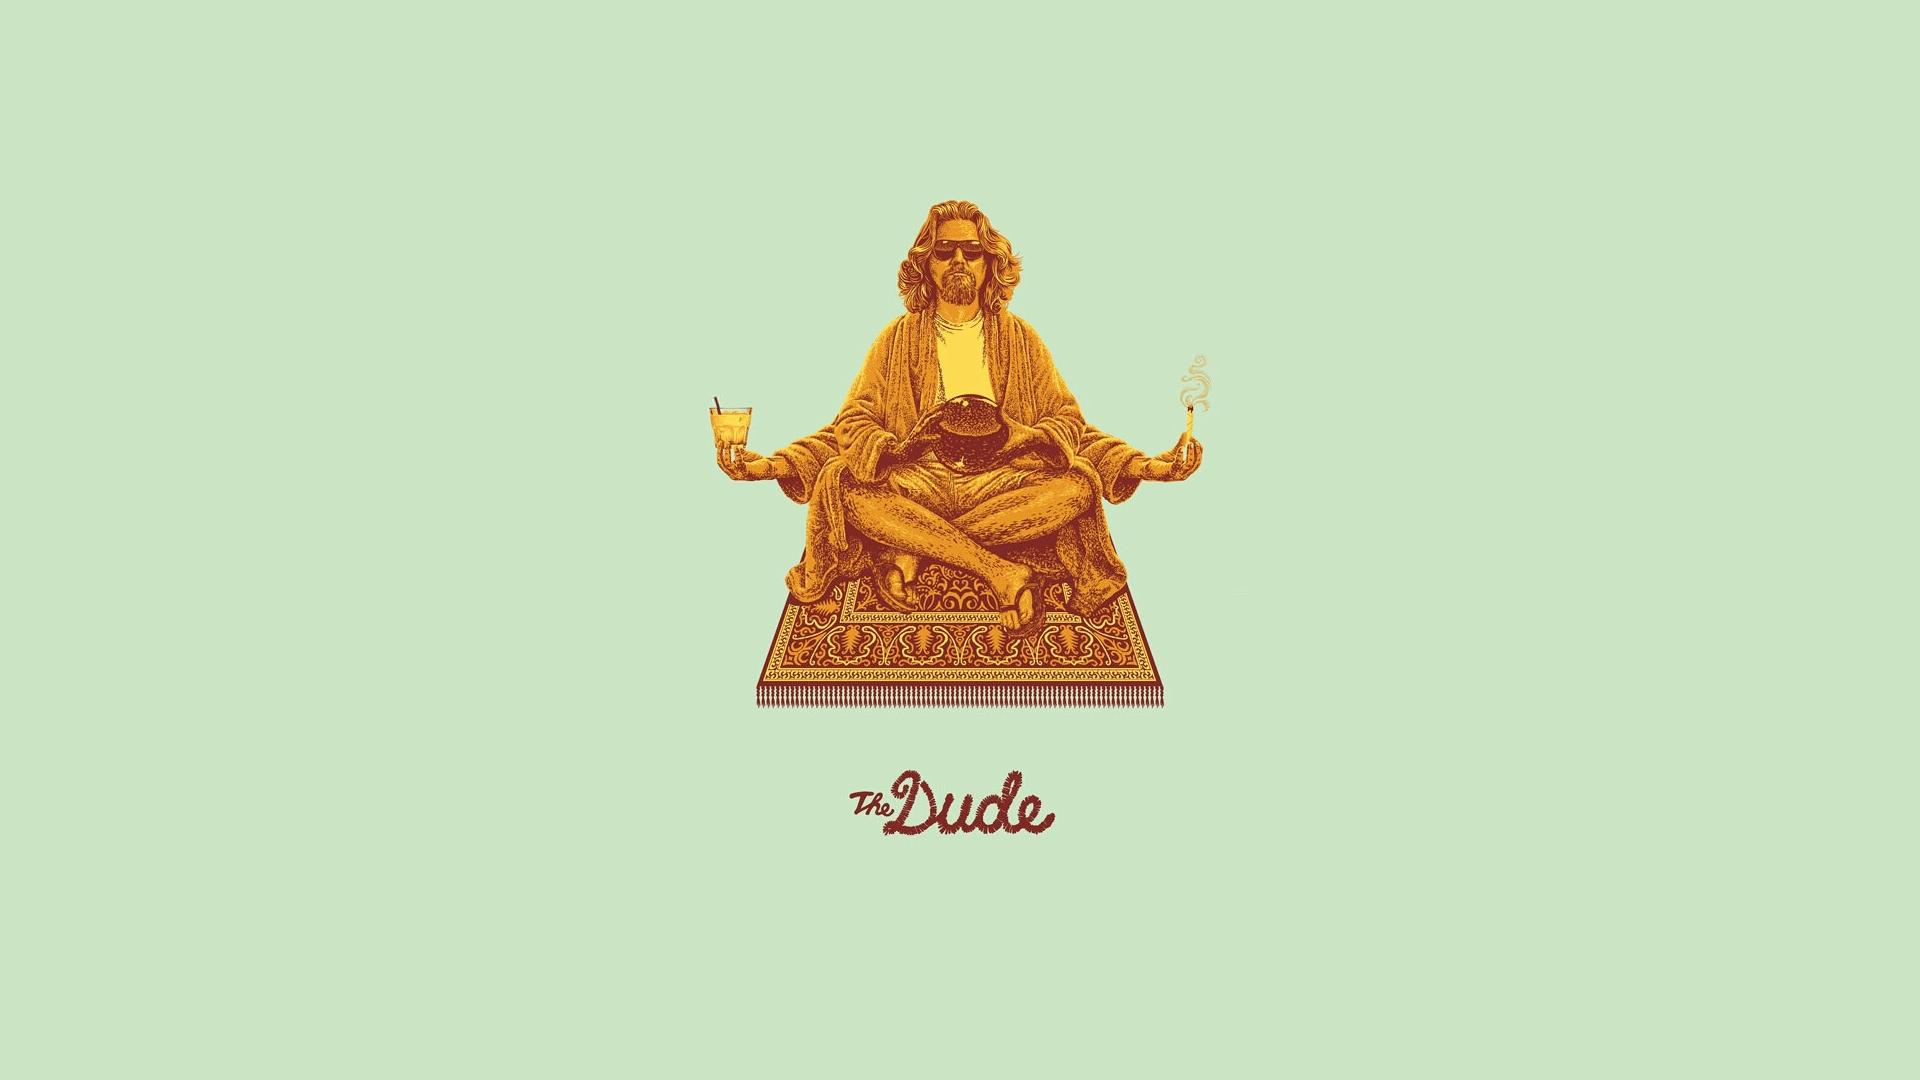 The Dude wallpaper Big Lebowski The Dude meditating on carpet lotus 1920x1080